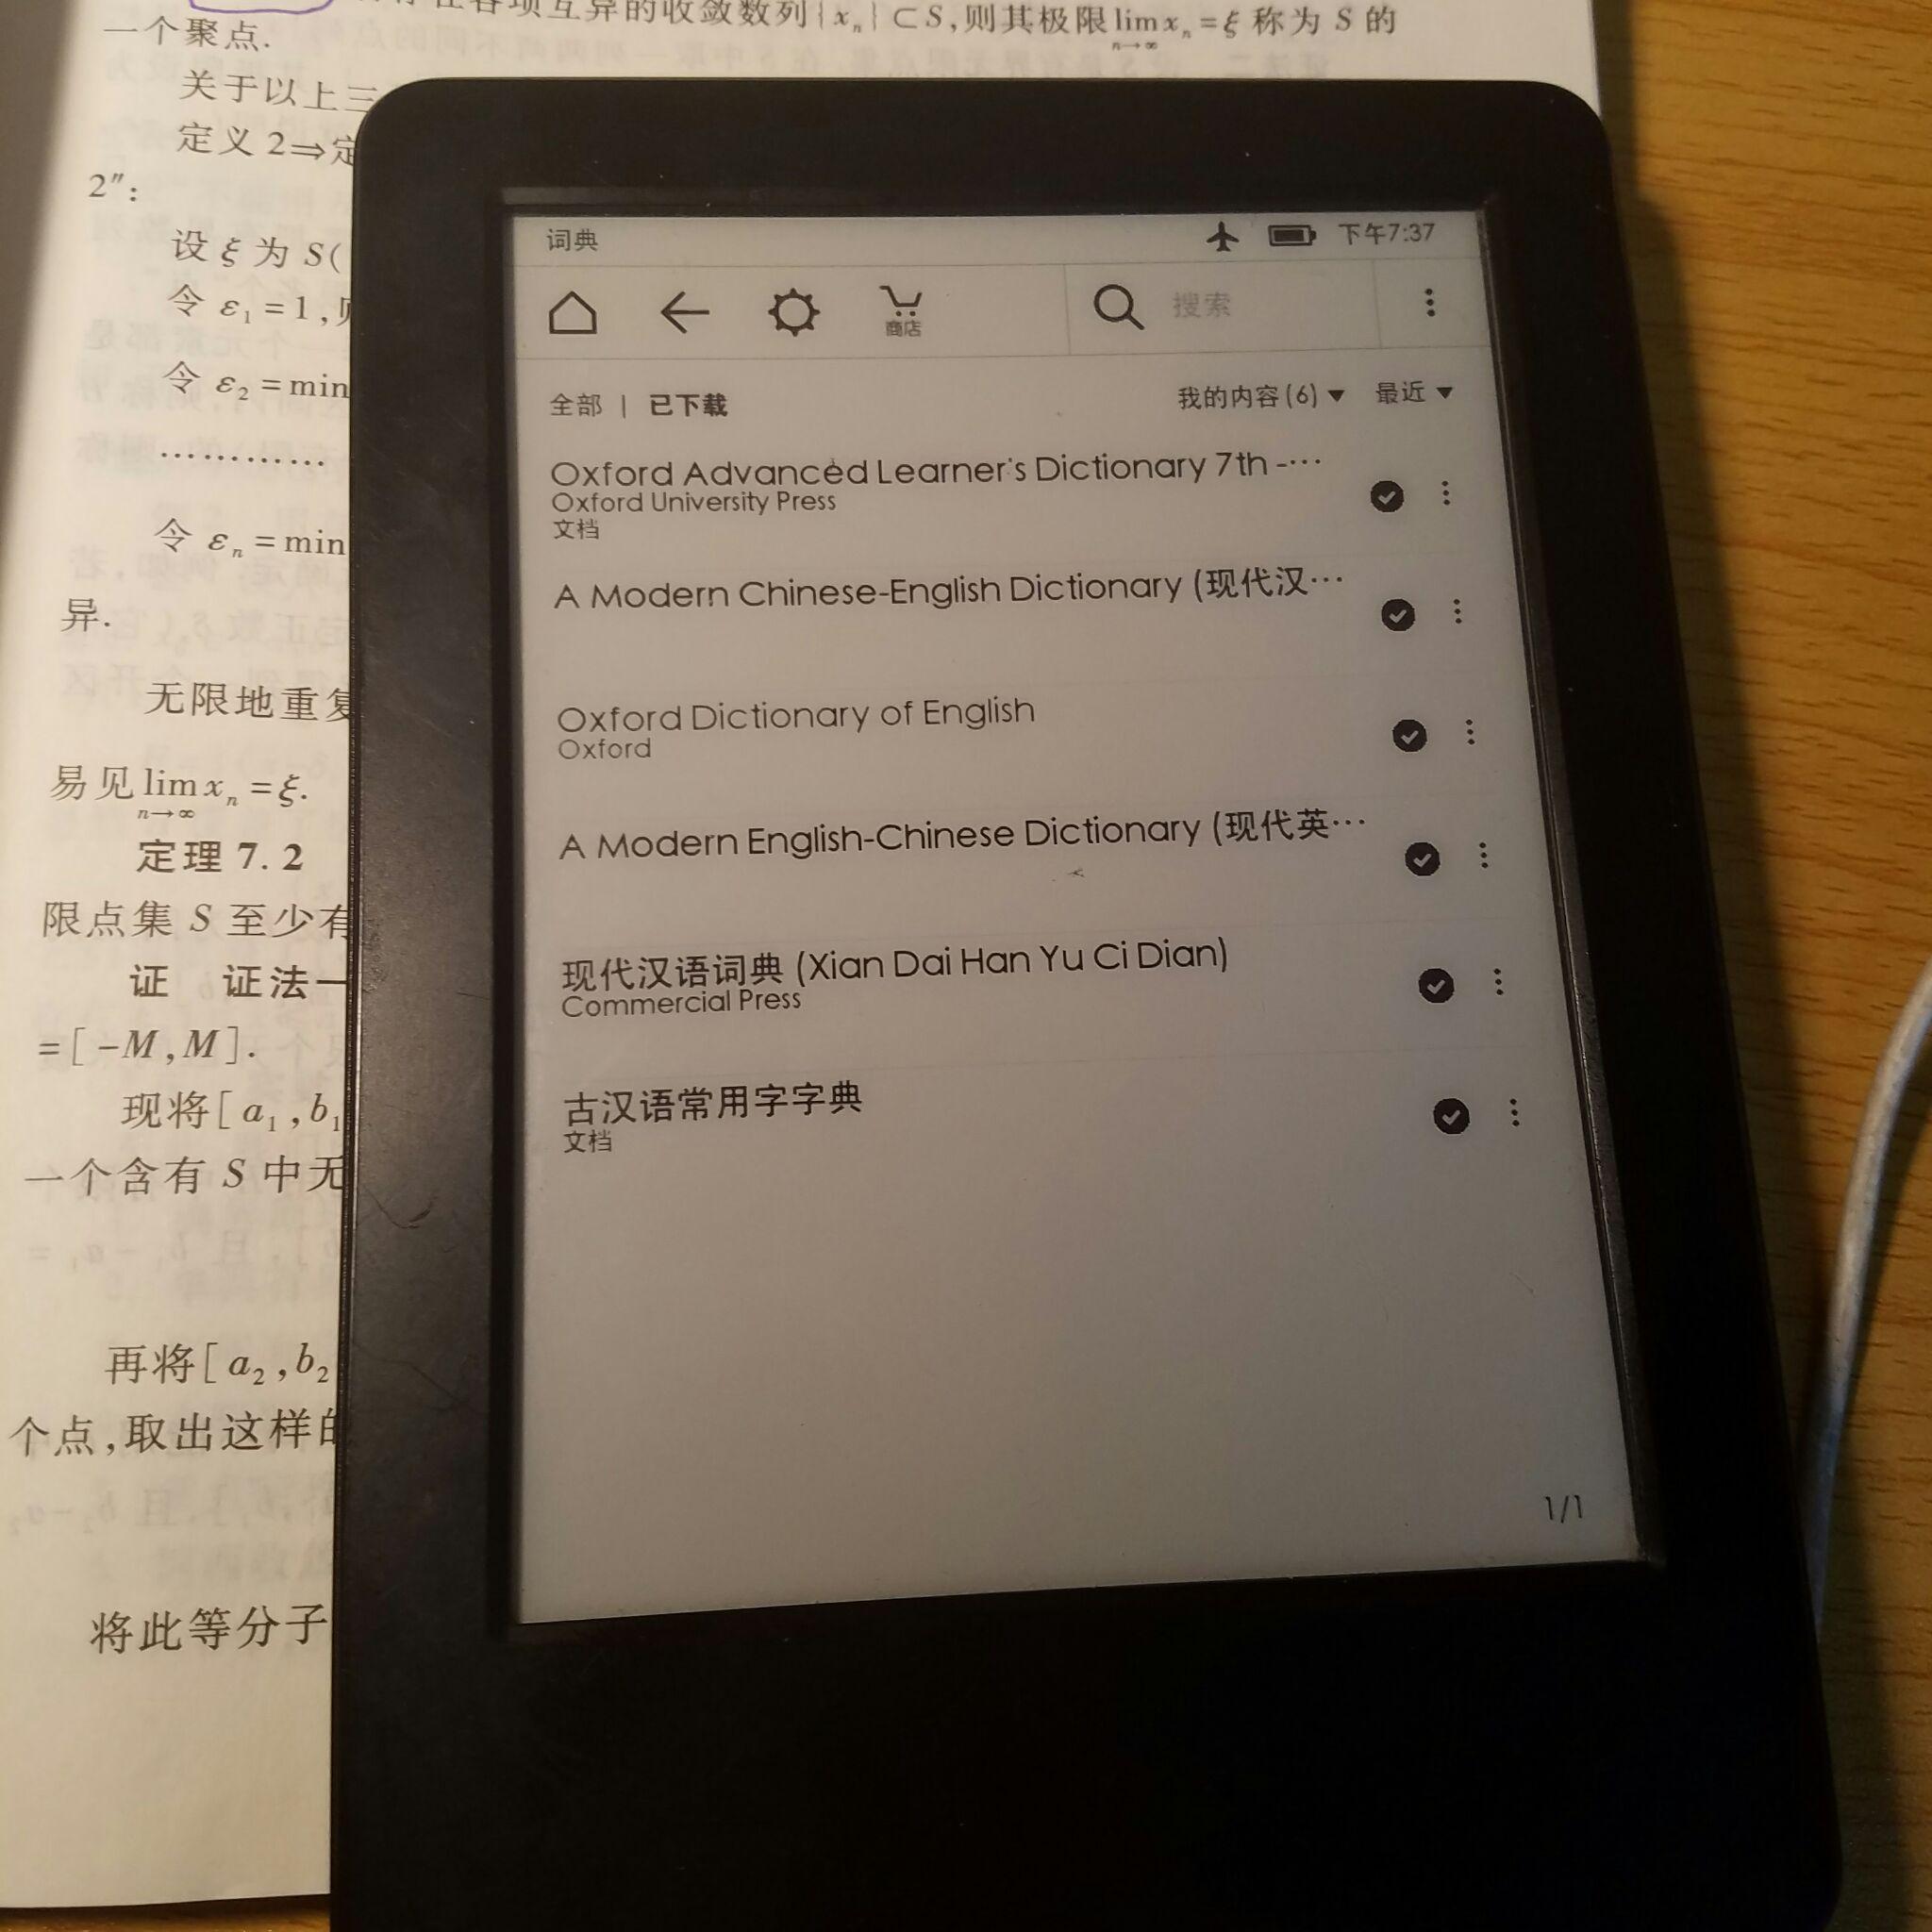 Kindle 有哪些鲜为人知的使用技巧?